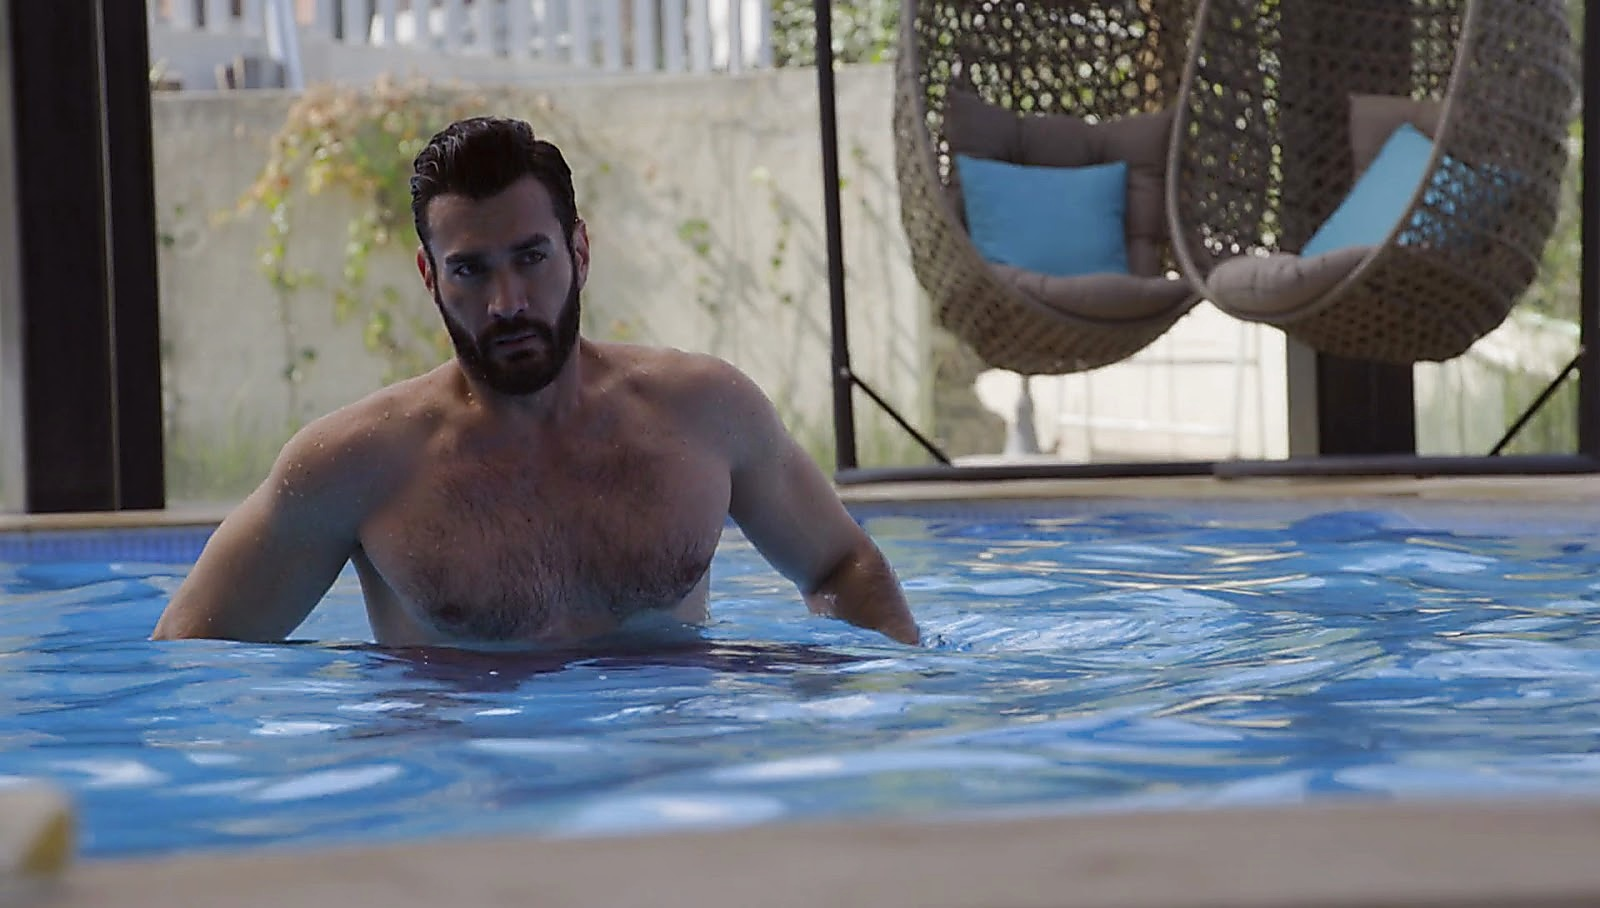 David Zepeda sexy shirtless scene June 19, 2017, 1pm